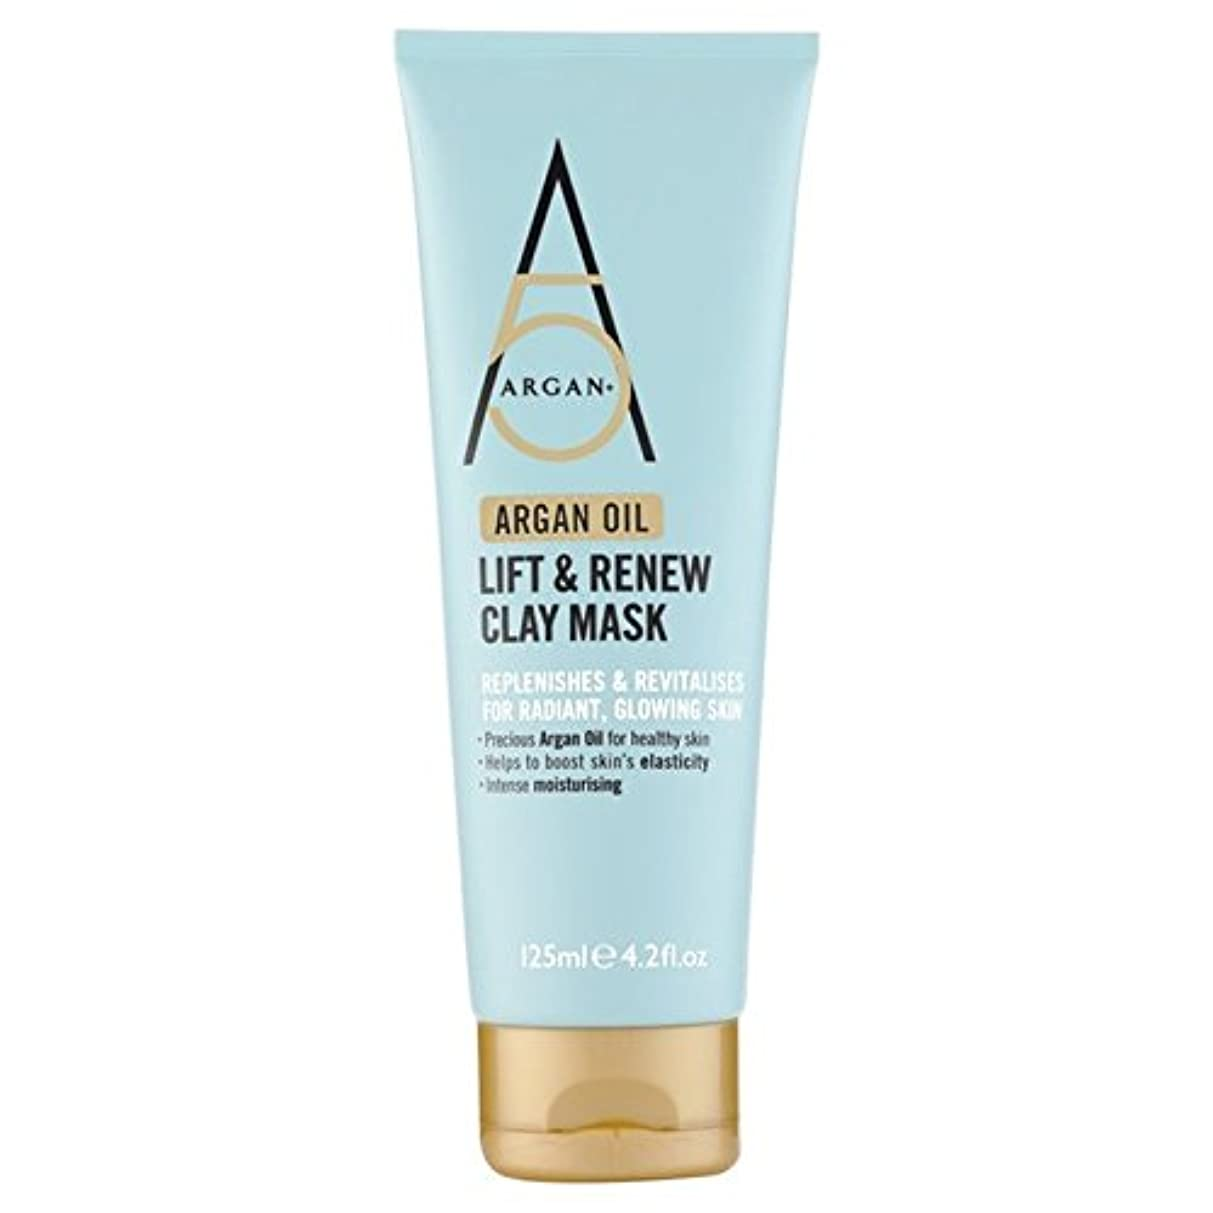 Argan+ Lift & Renew Clay Face Mask 125ml - アルガン+リフト&クレイフェイスマスク125ミリリットルを更新 [並行輸入品]